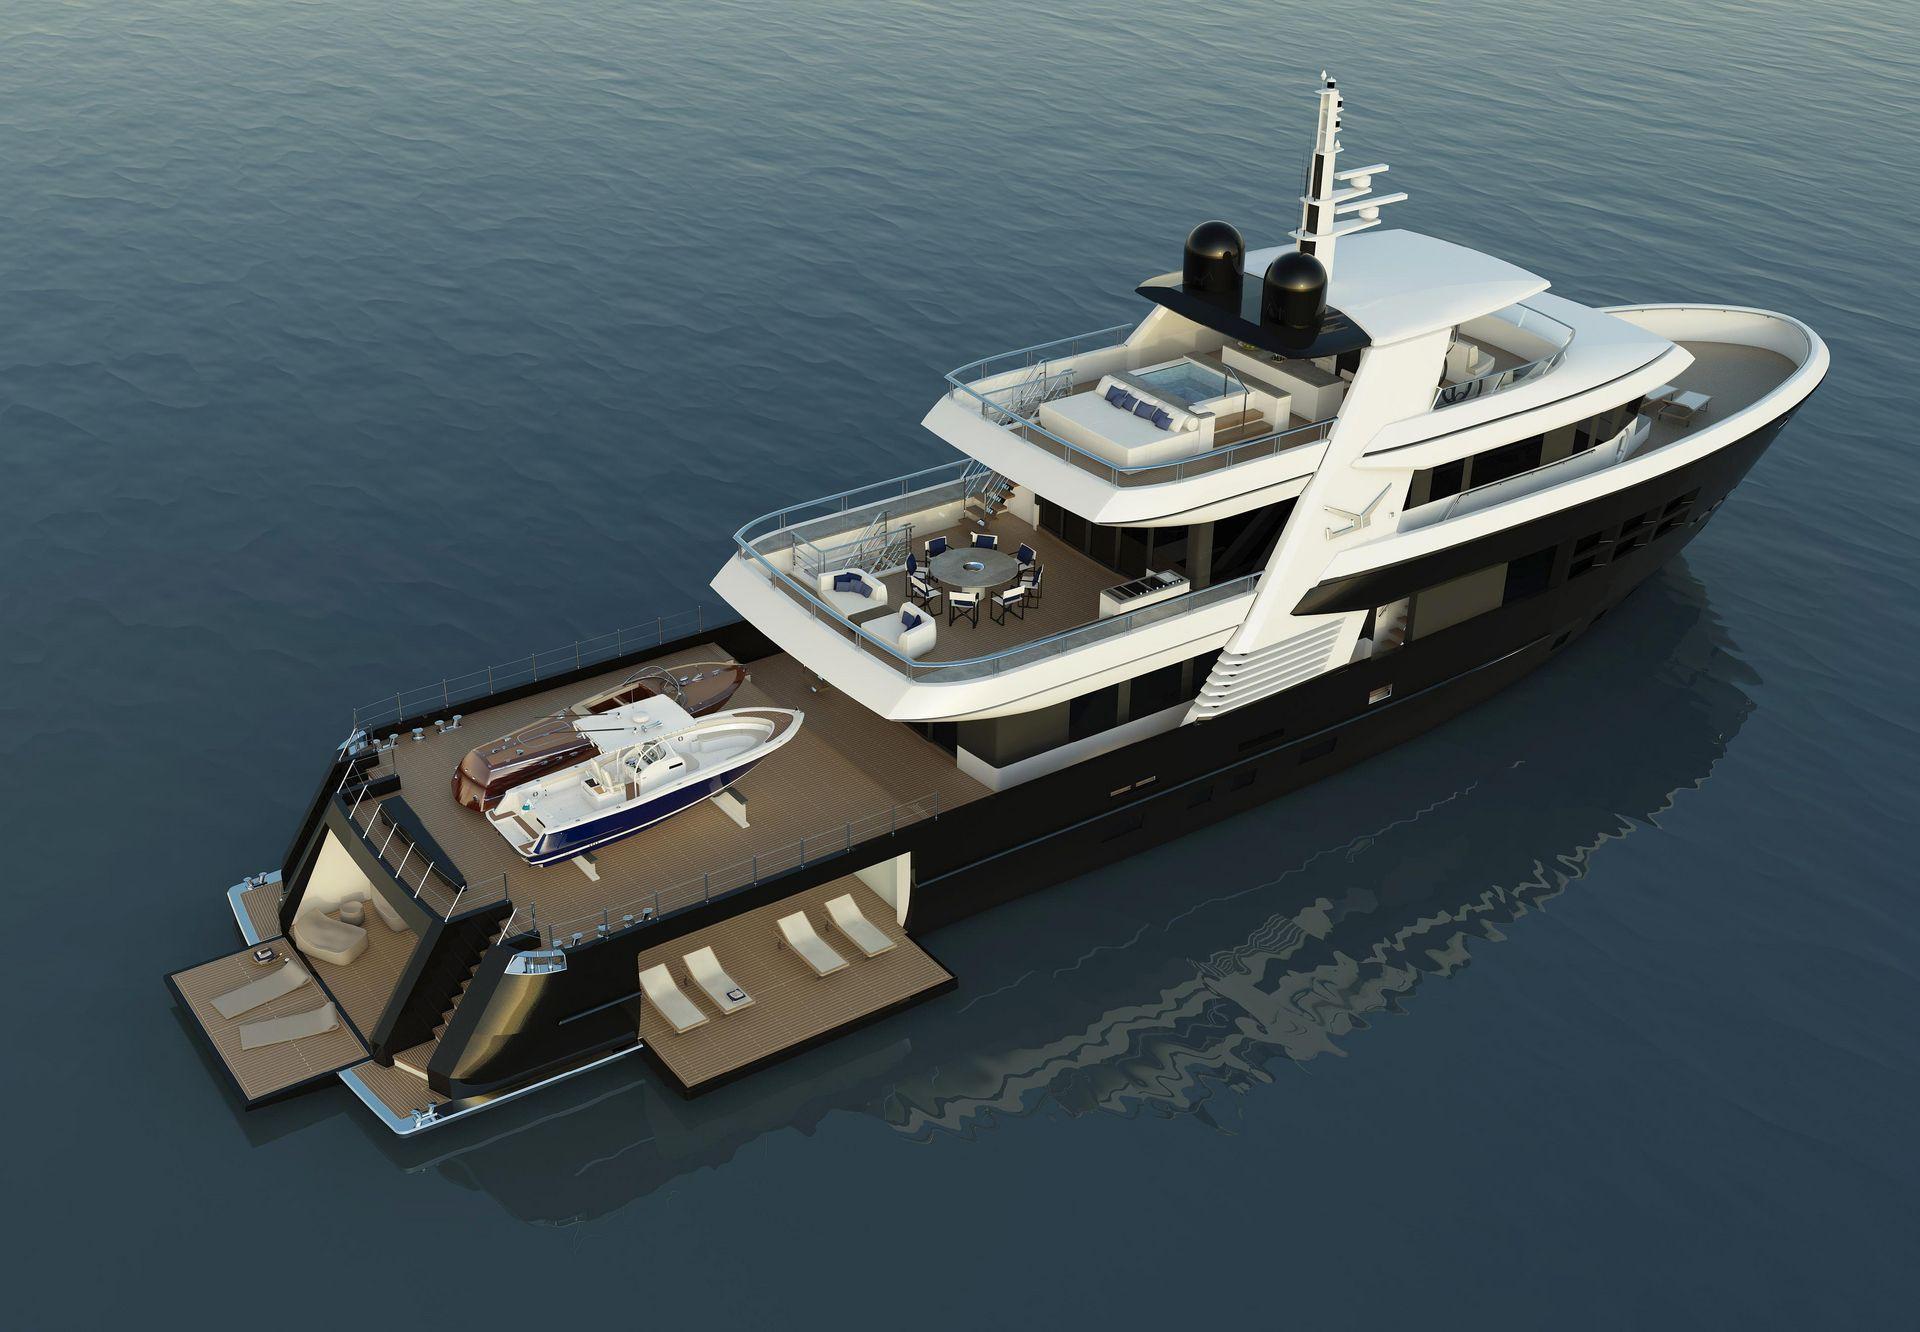 Exterior design of Bandido Yachts -  - Drettmann Yachts